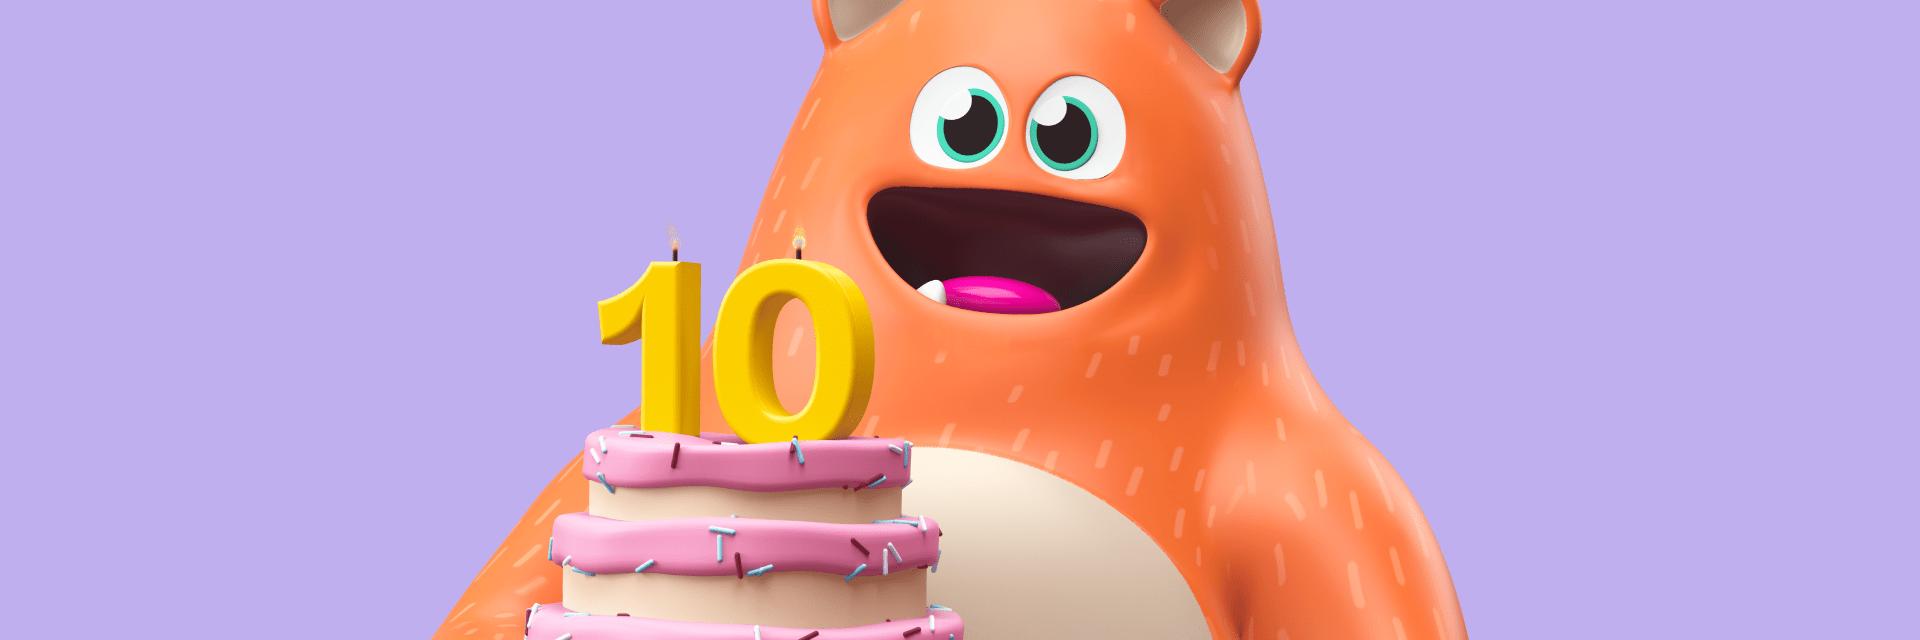 Prodigy Education's 10th birthday